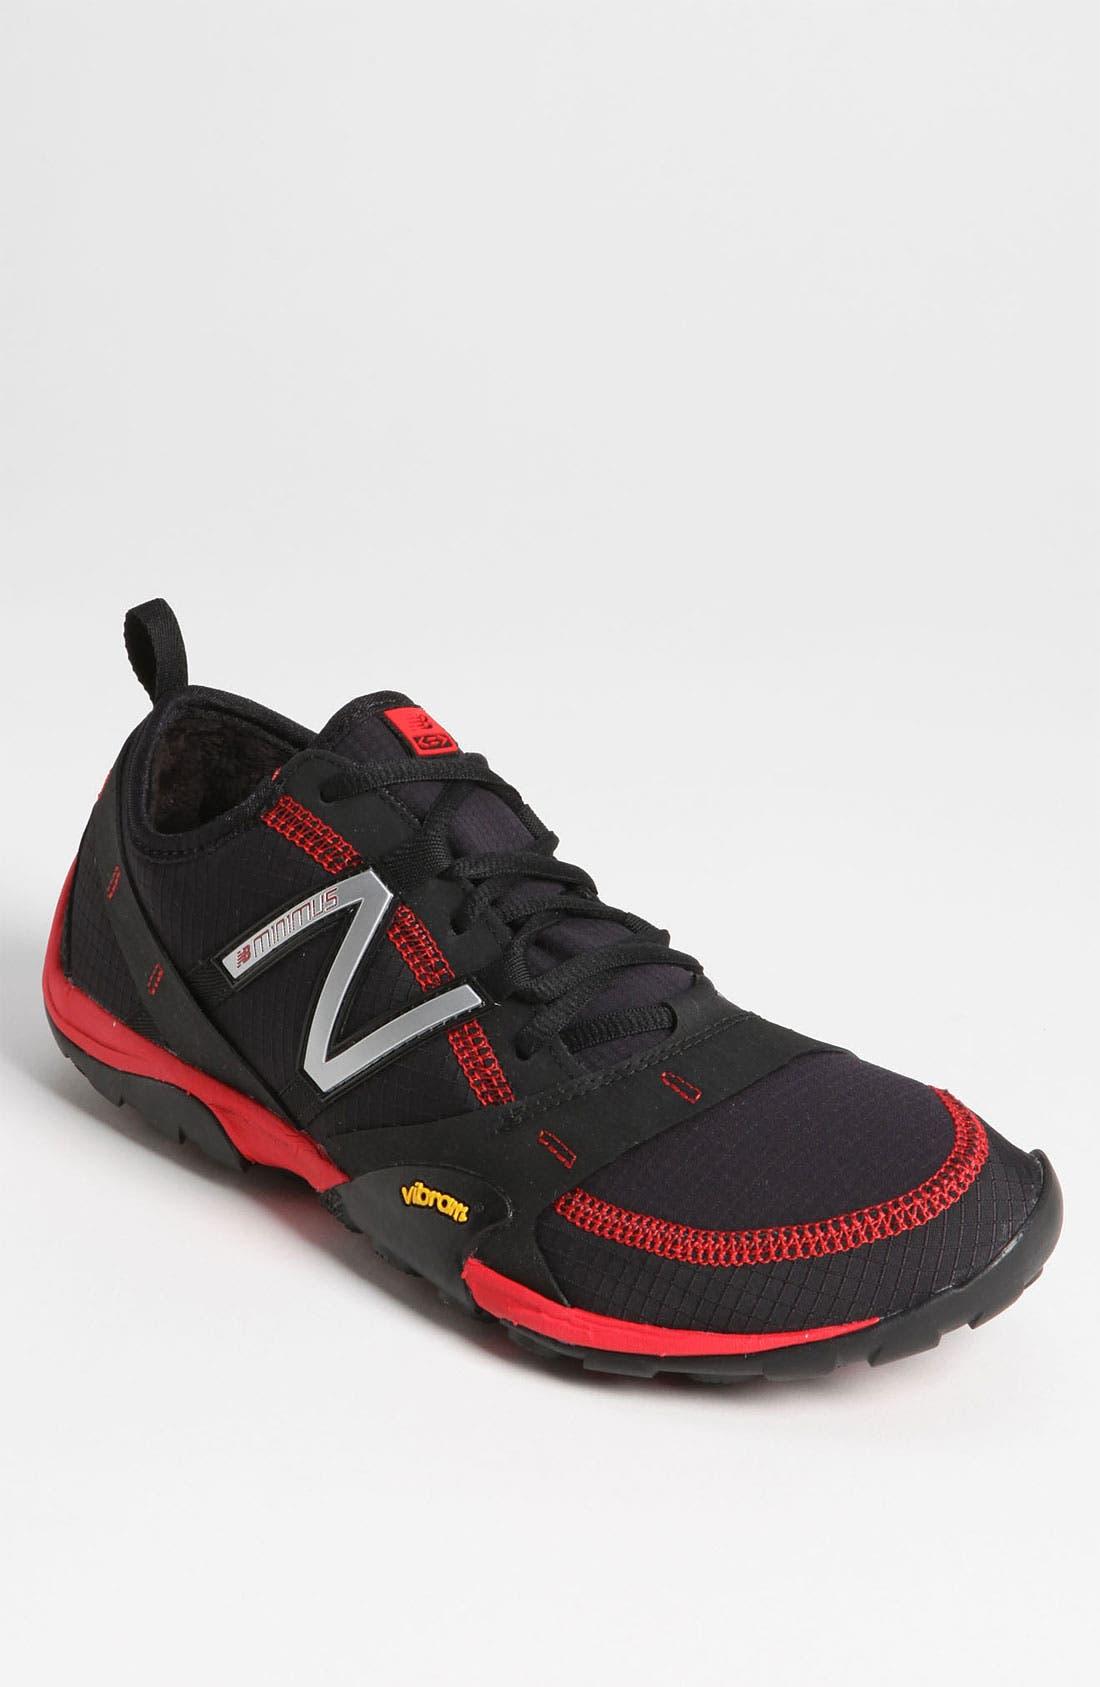 Main Image - New Balance 'Minimus MO10' Running Shoe (Men) (Online Only)